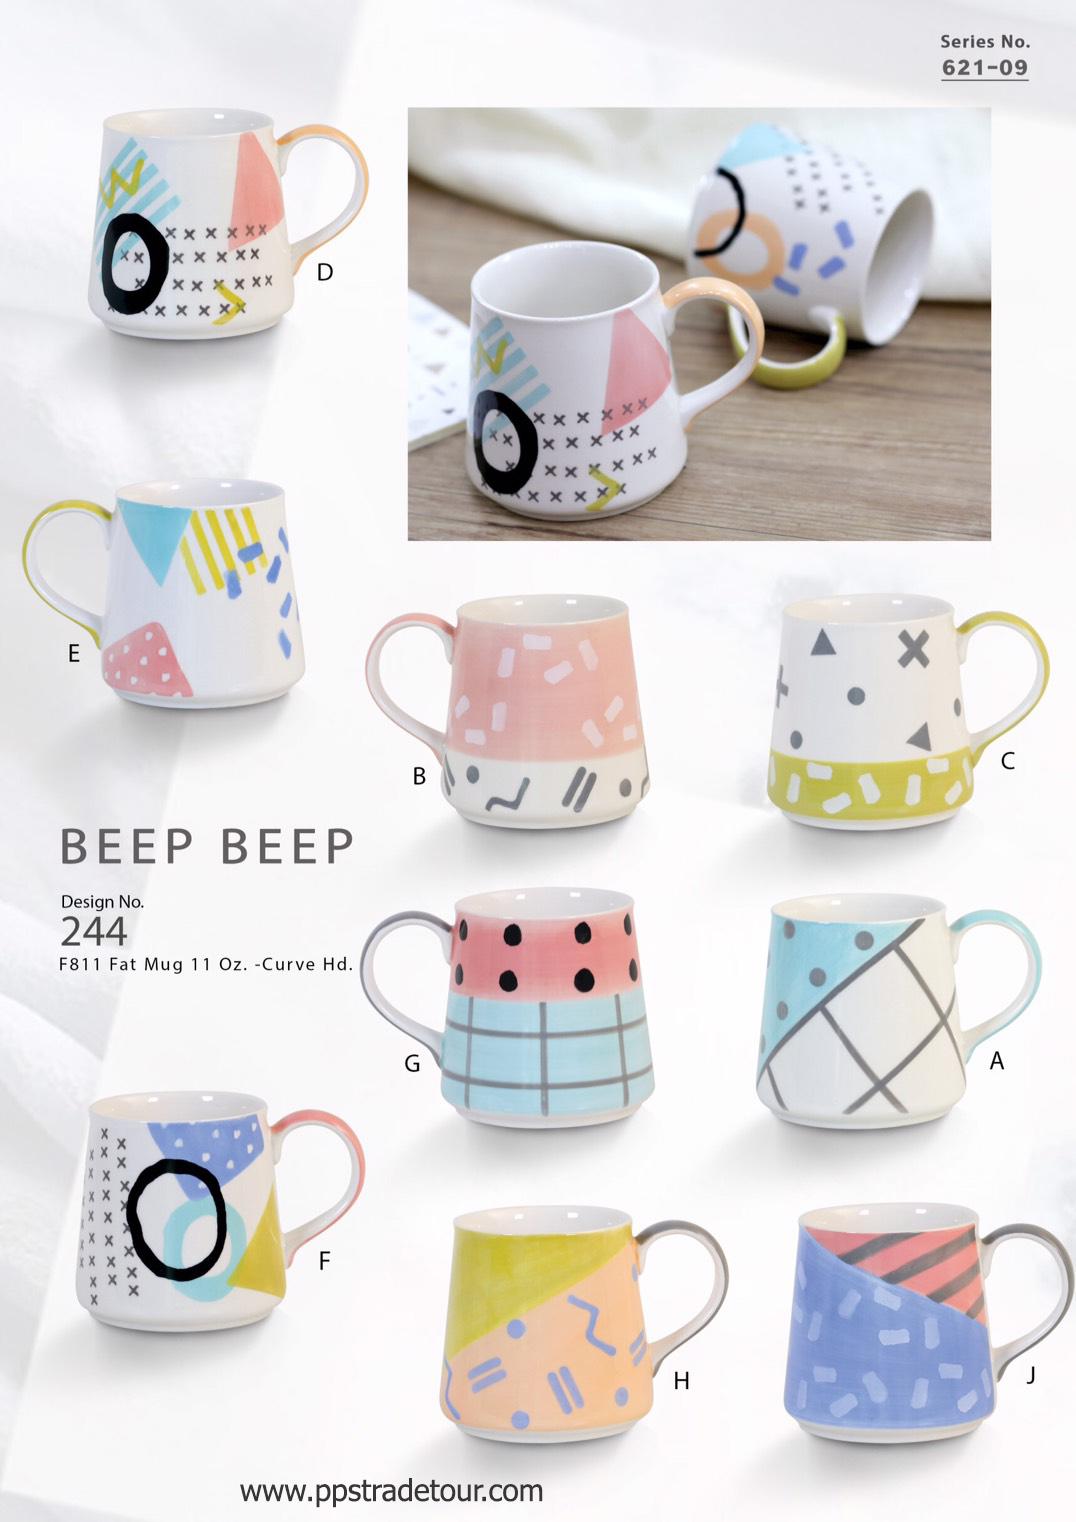 Beep Beep-Ceramic Mug 11Oz.